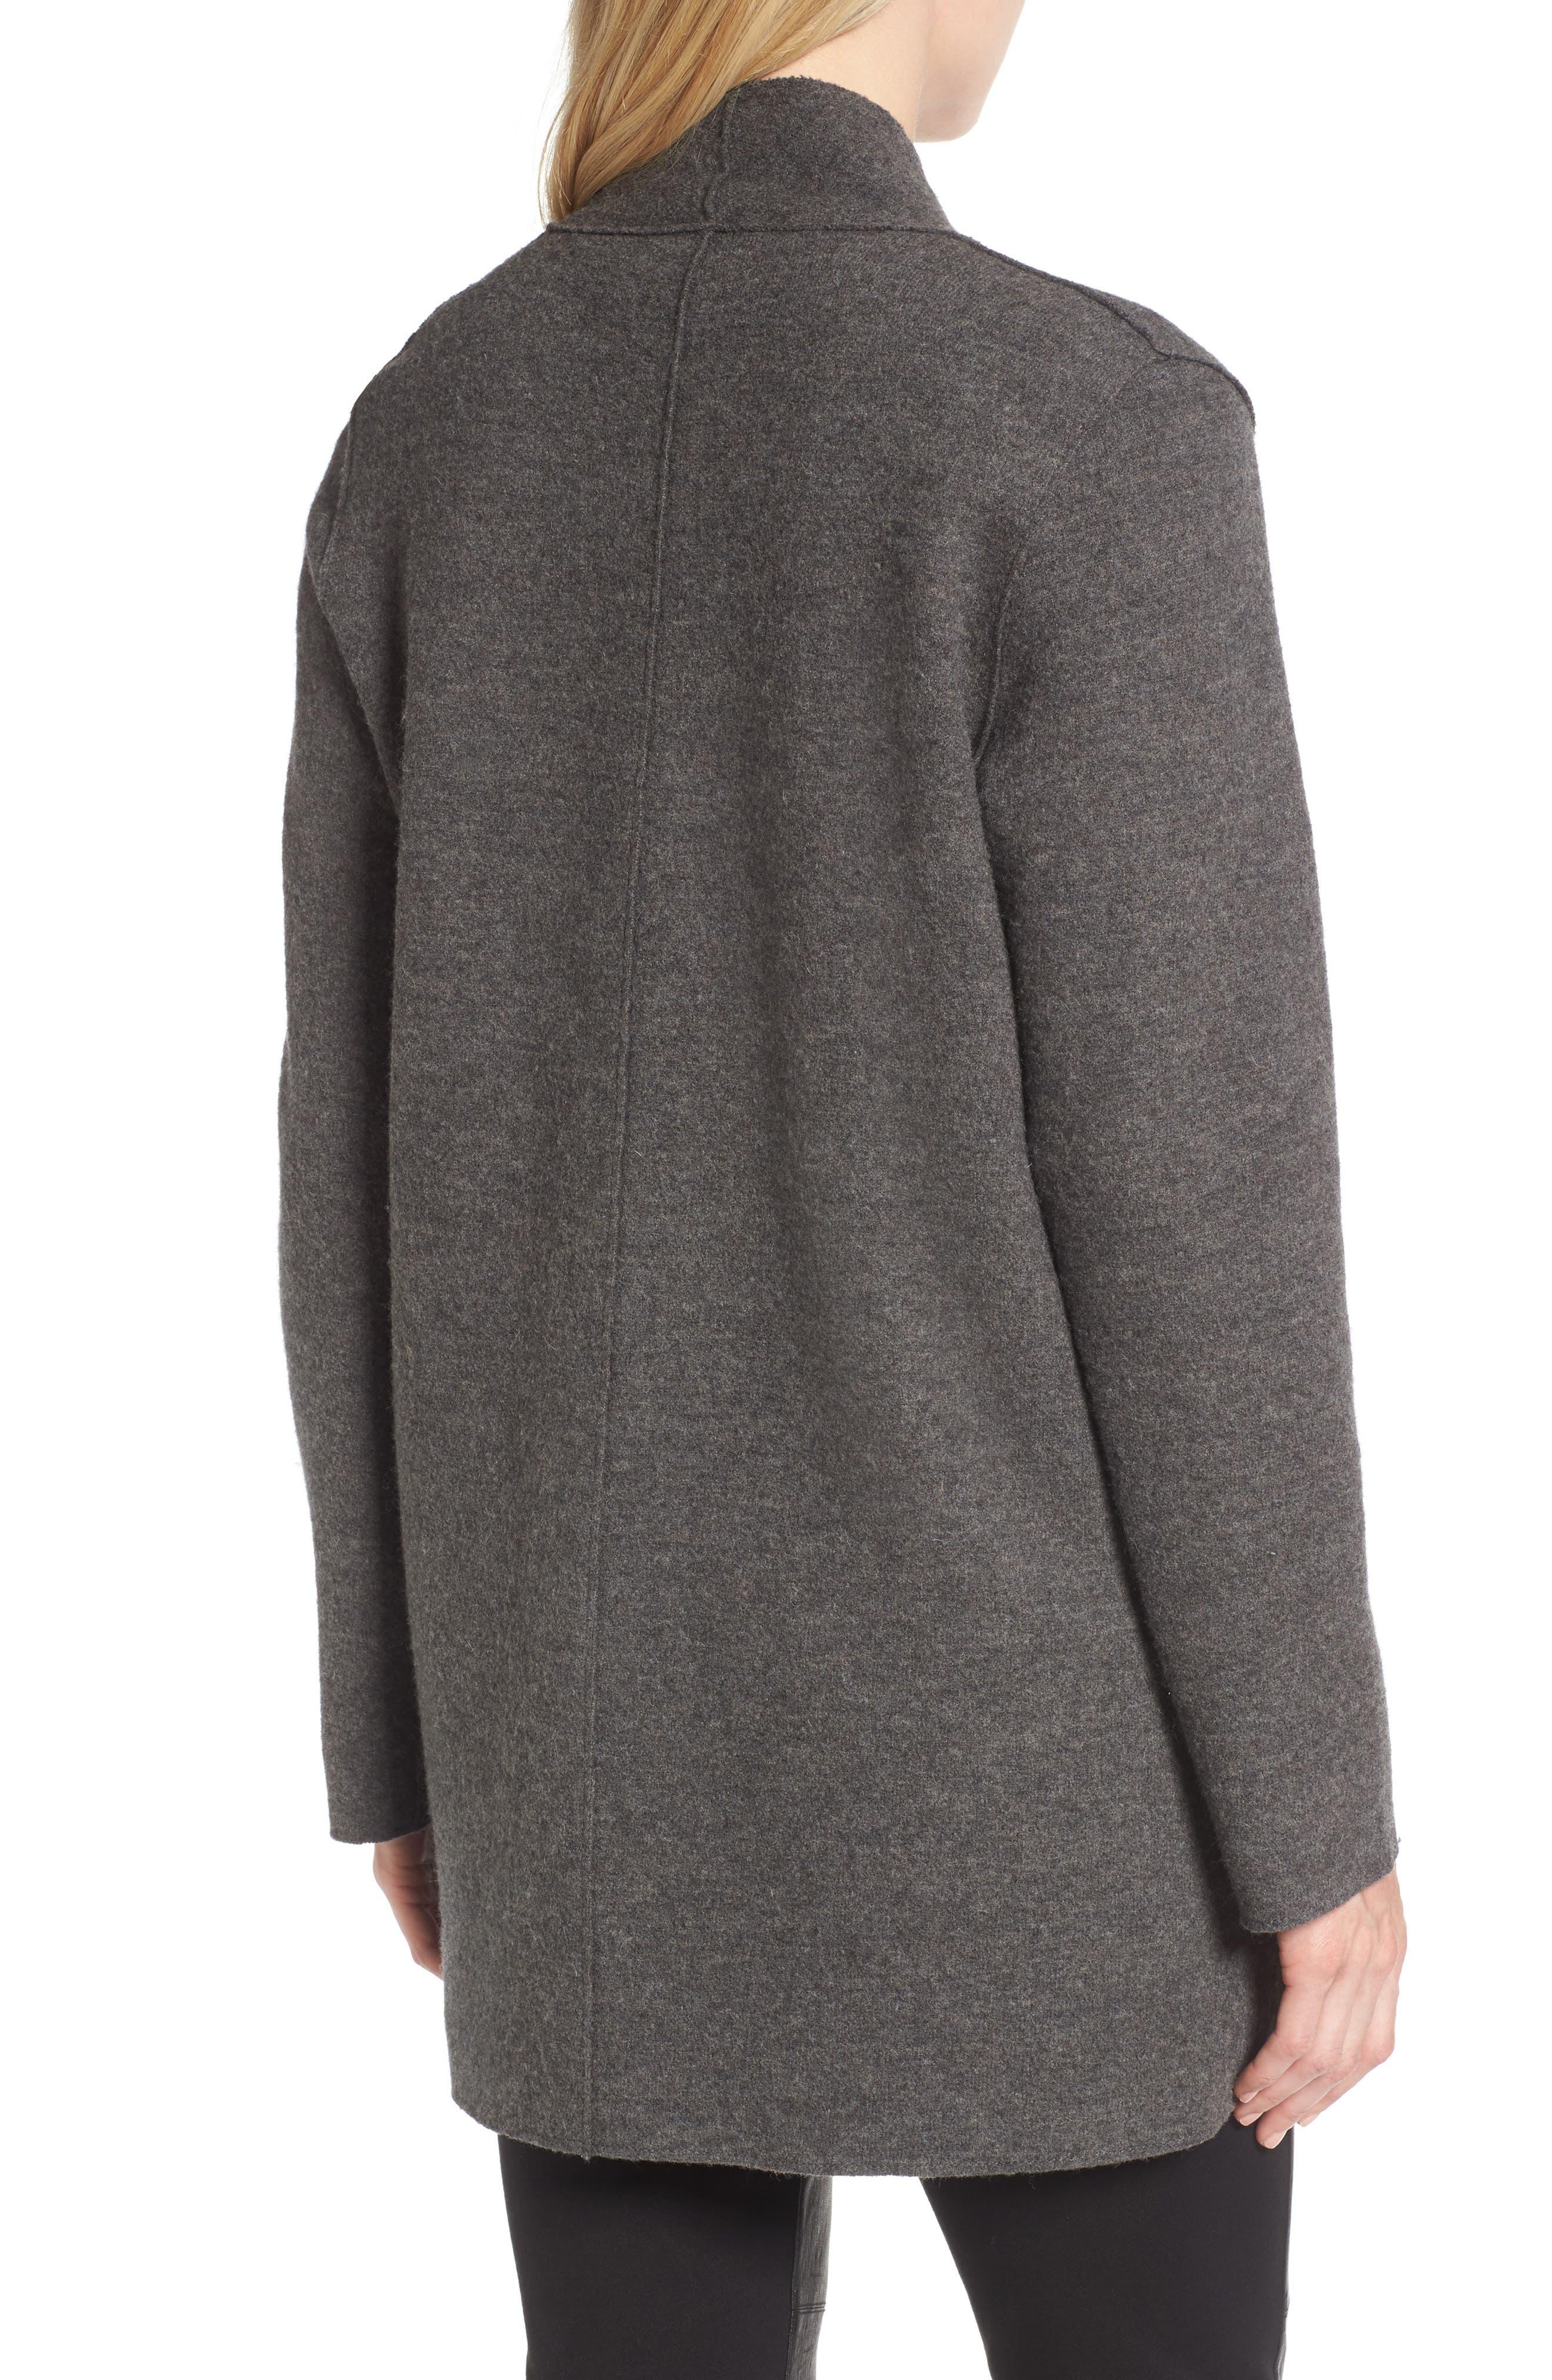 Boiled Wool Jacket,                             Alternate thumbnail 2, color,                             210